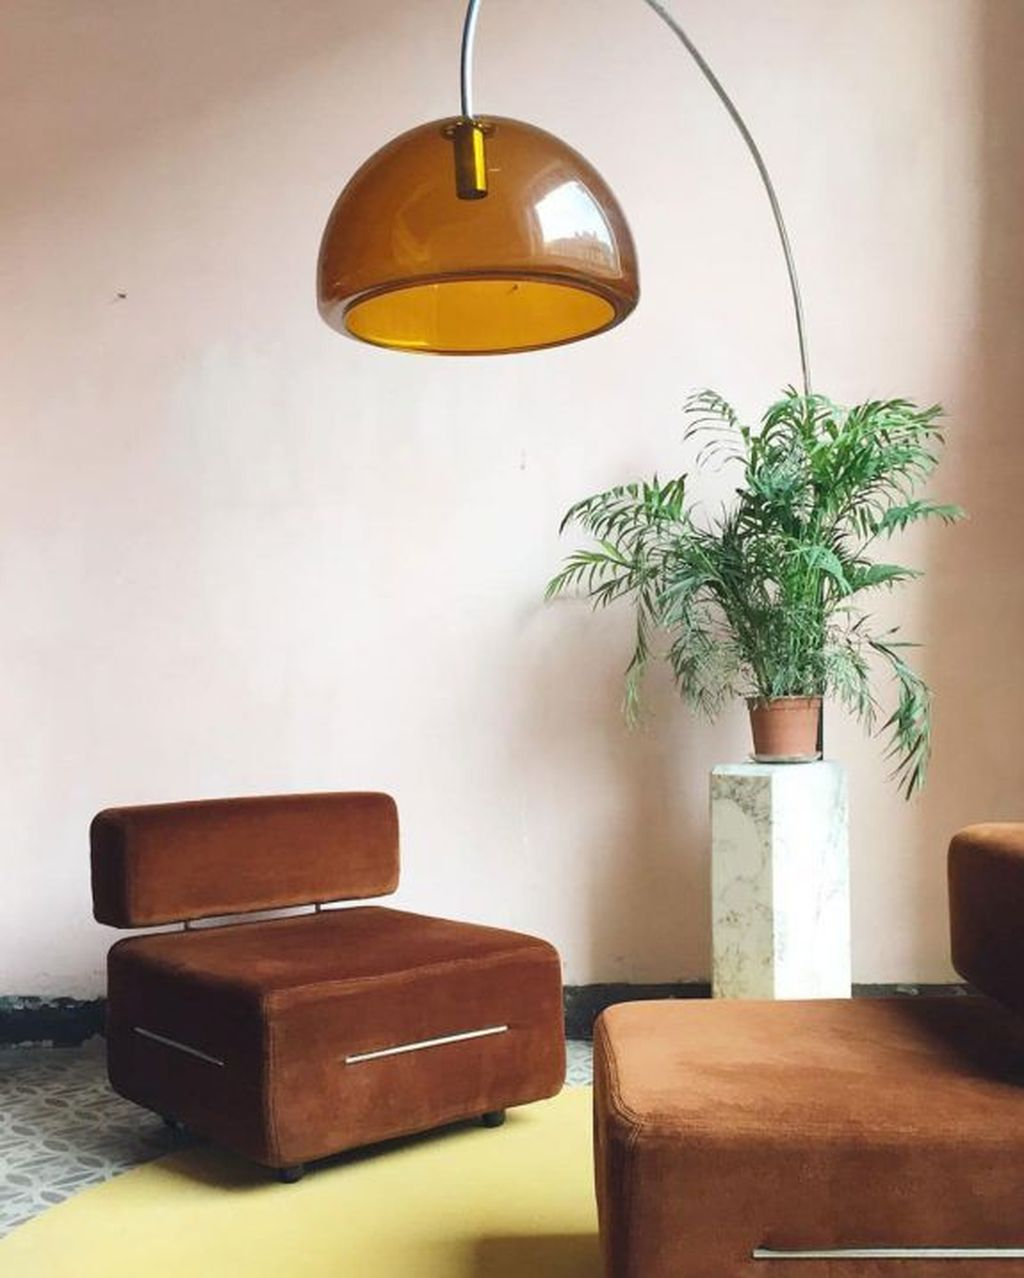 Inspiring Modern Home Furnishings Design Ideas 15